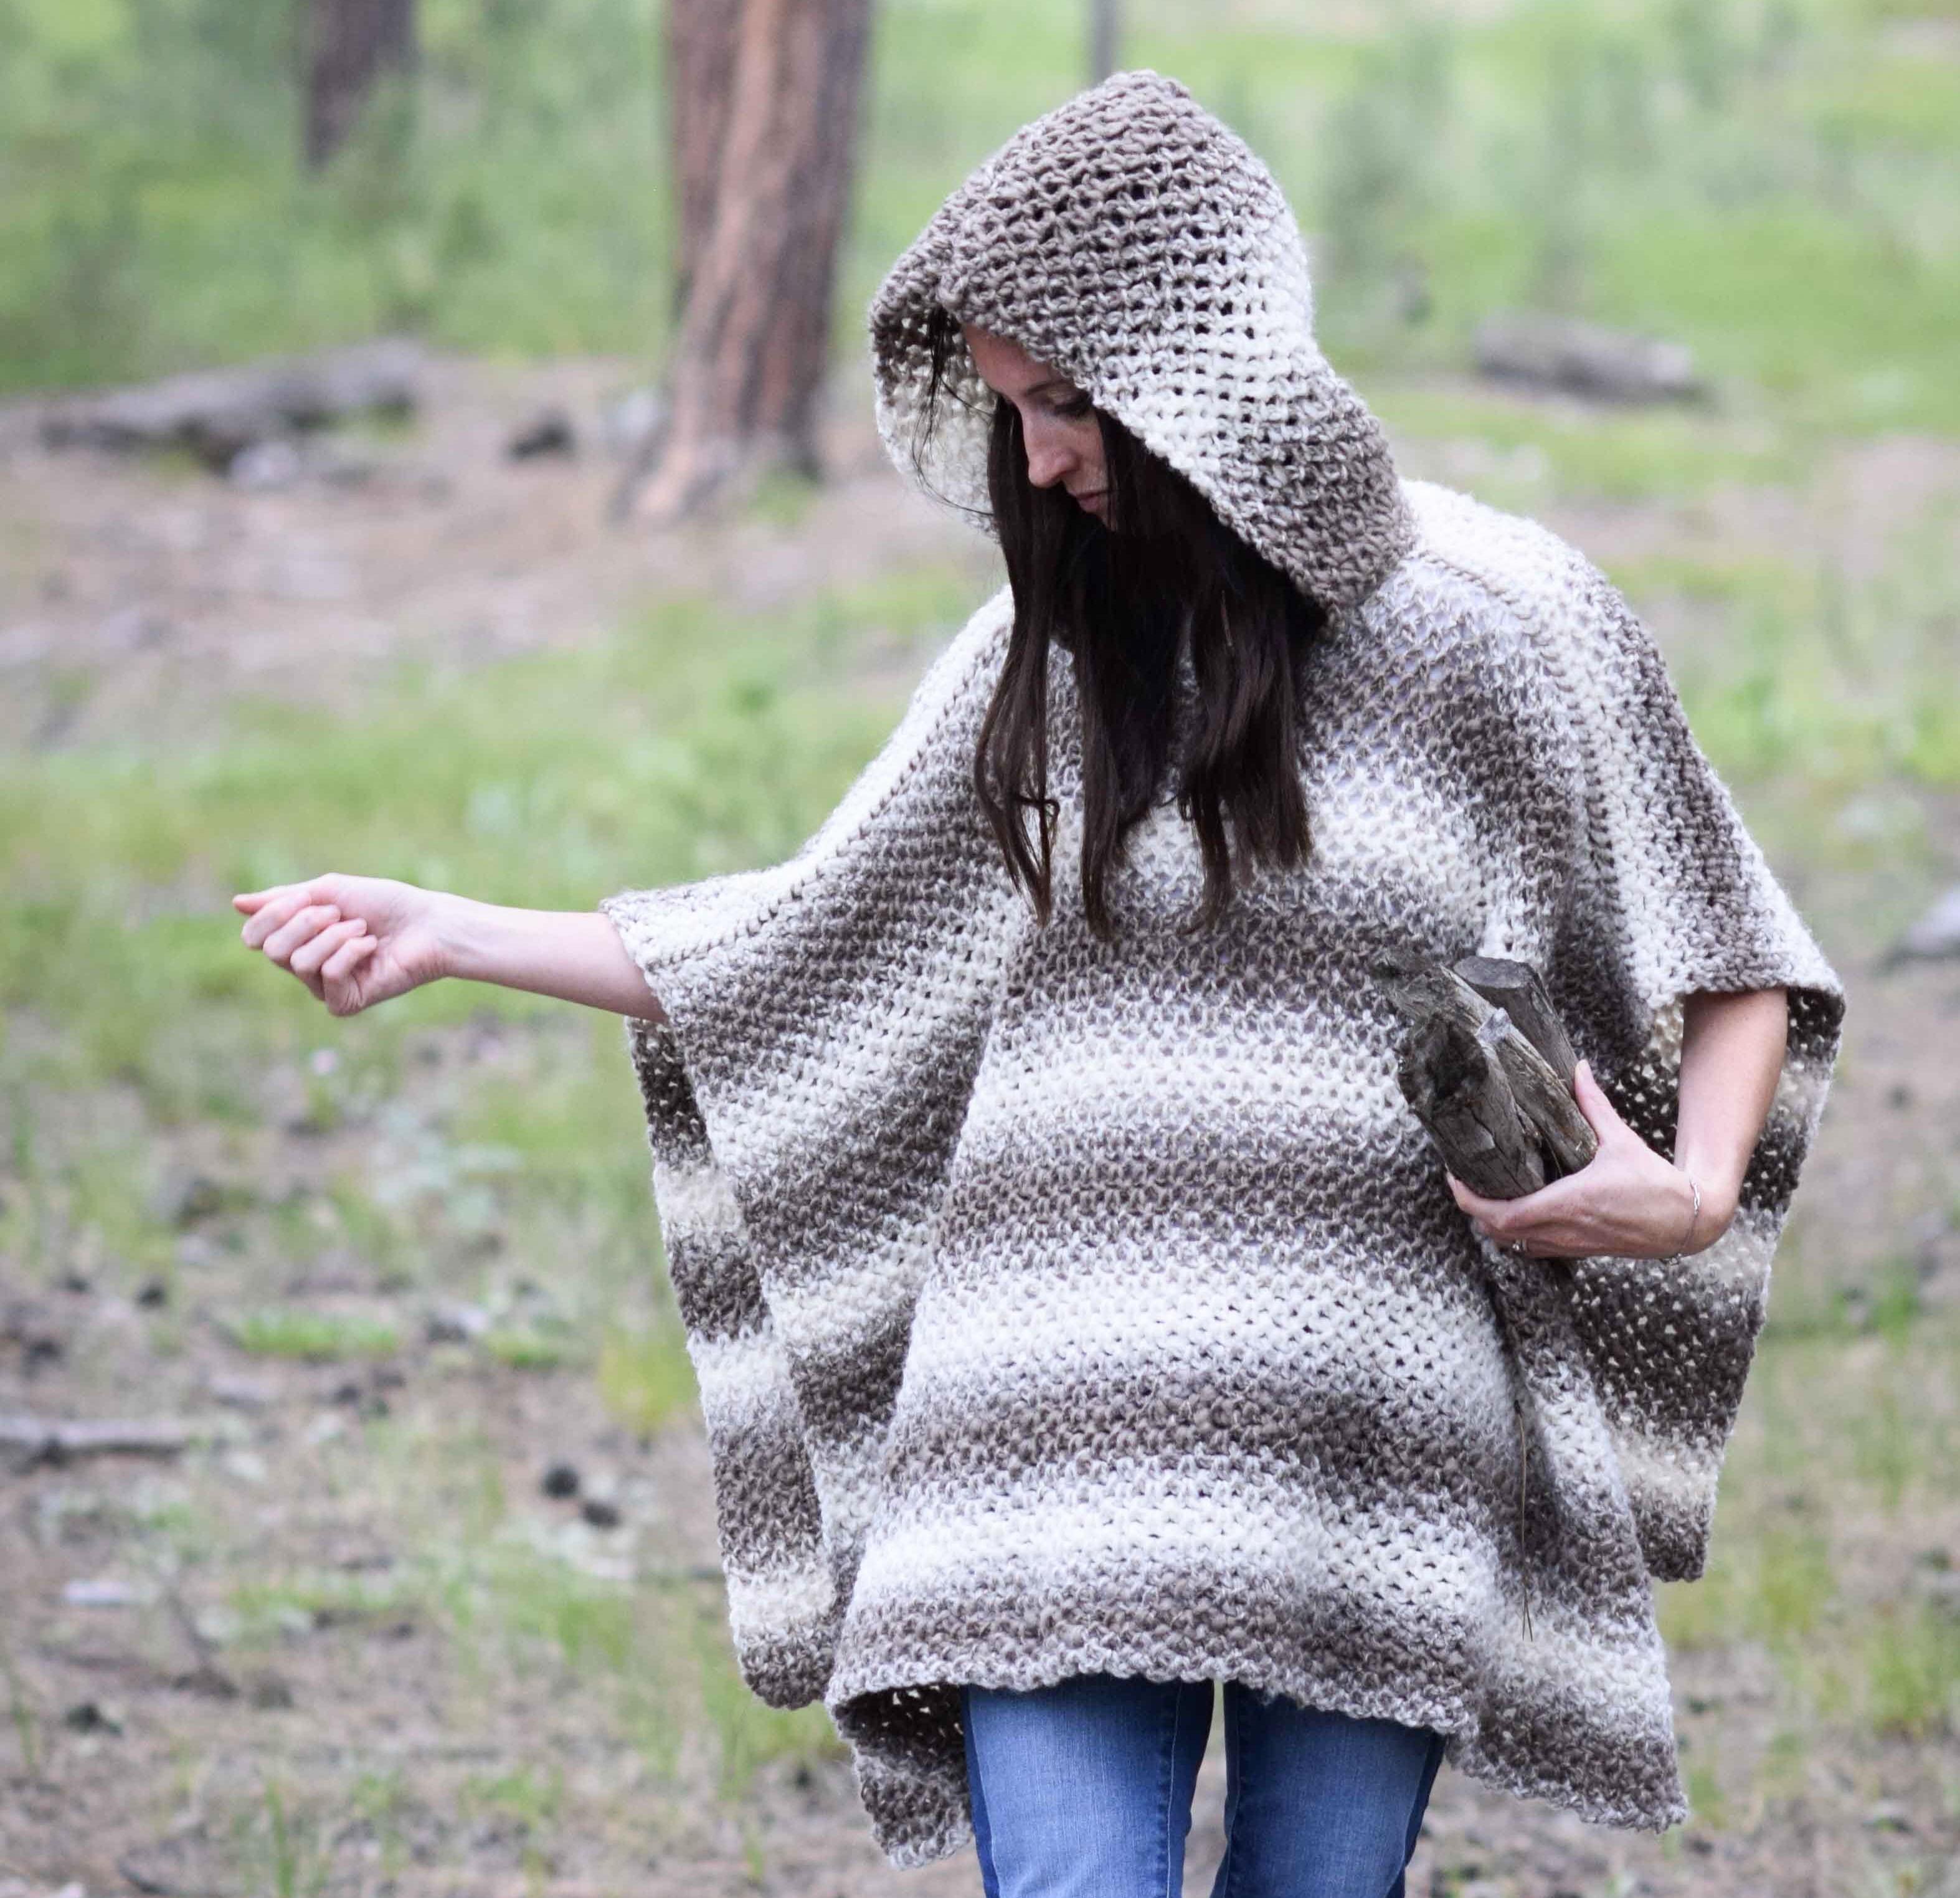 Driftwood Over-Sized Hooded Poncho Crochet Kit